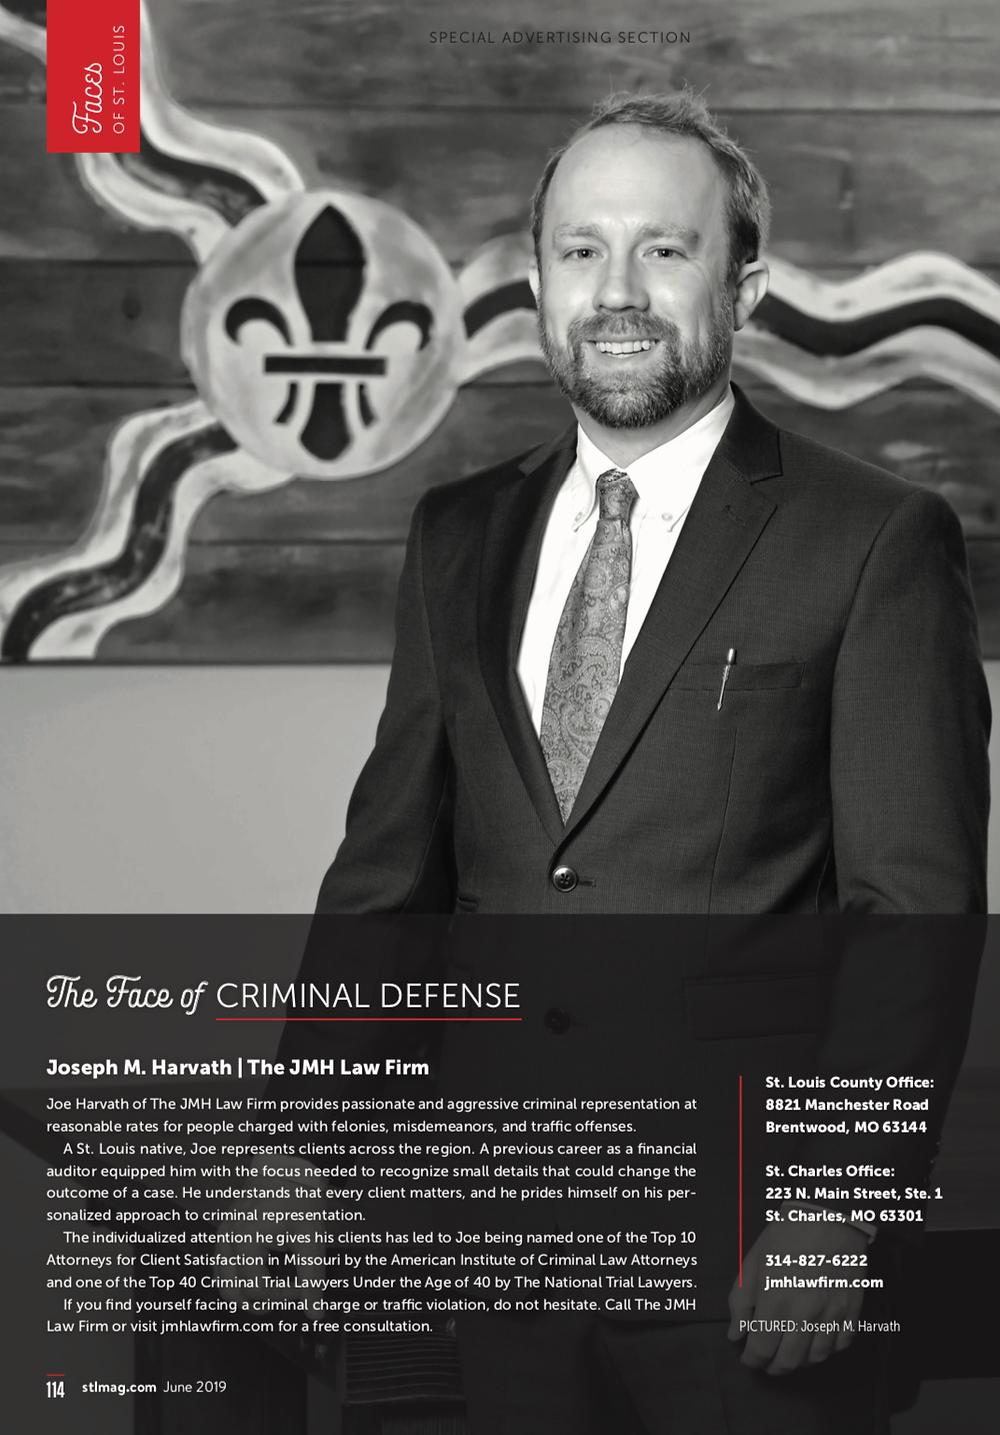 Joe Harvath Face of Criminal Defense